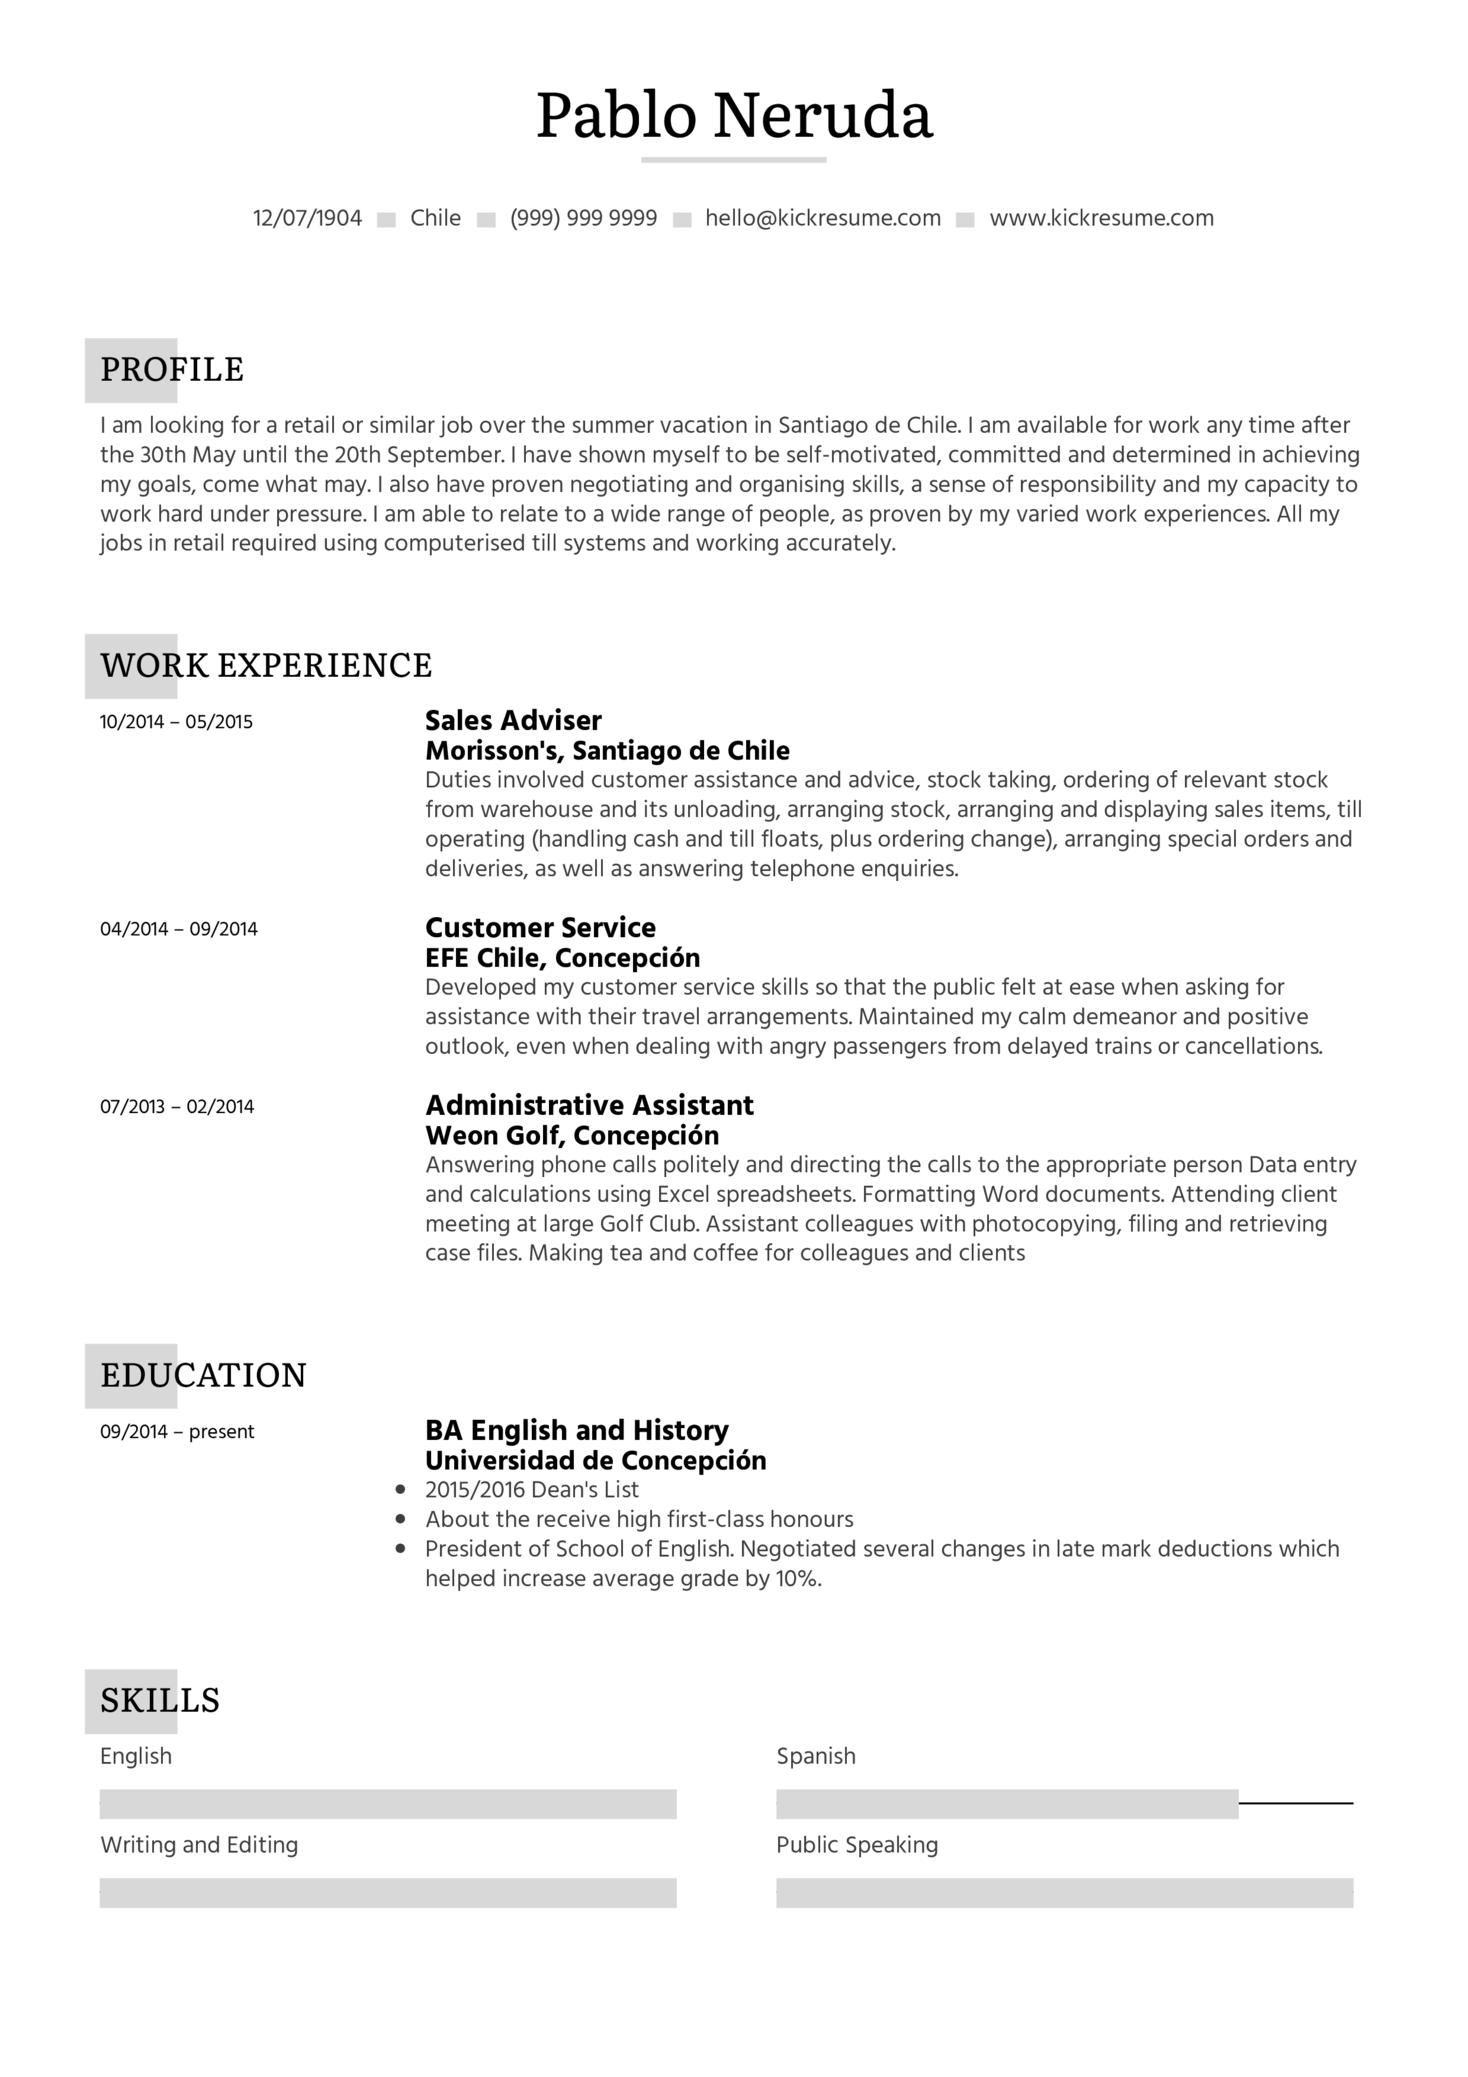 Student Resume Summer Job (Teil 1)